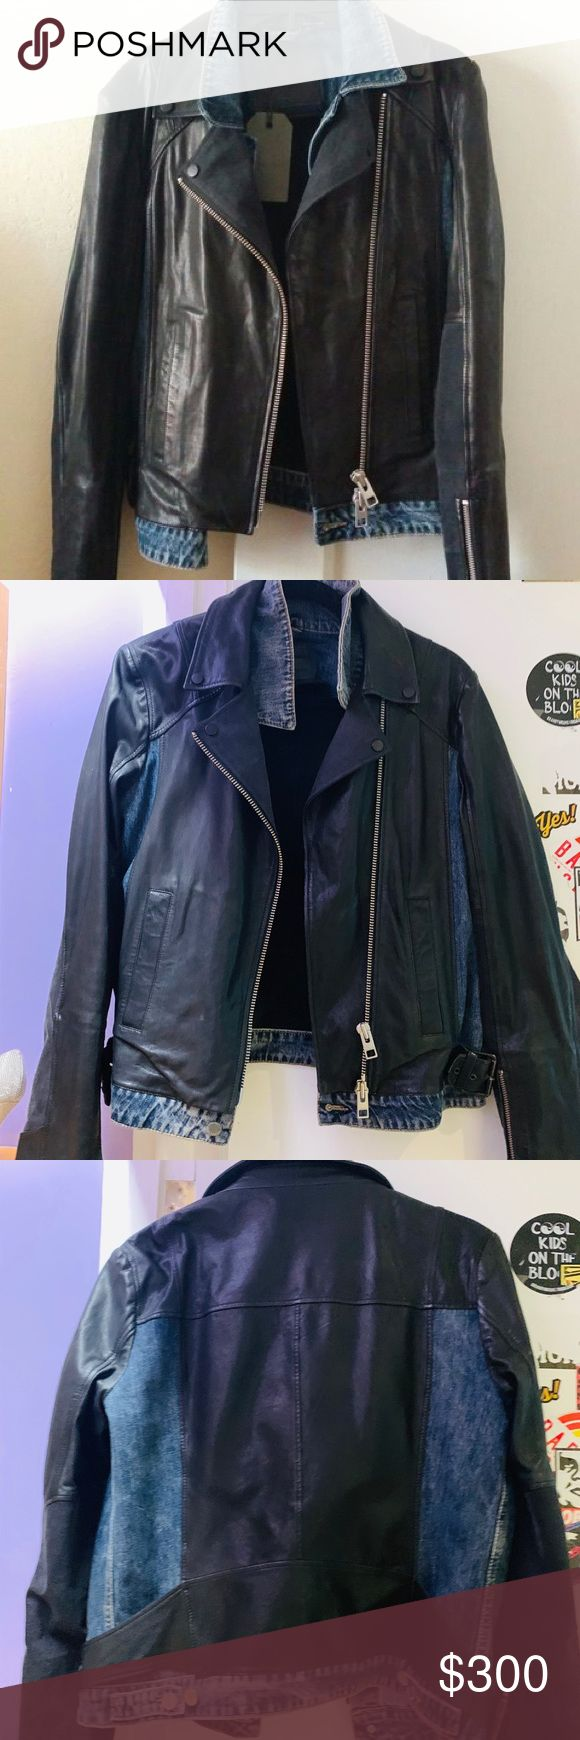 All saints DENIM Leather jacket All saints jacket with